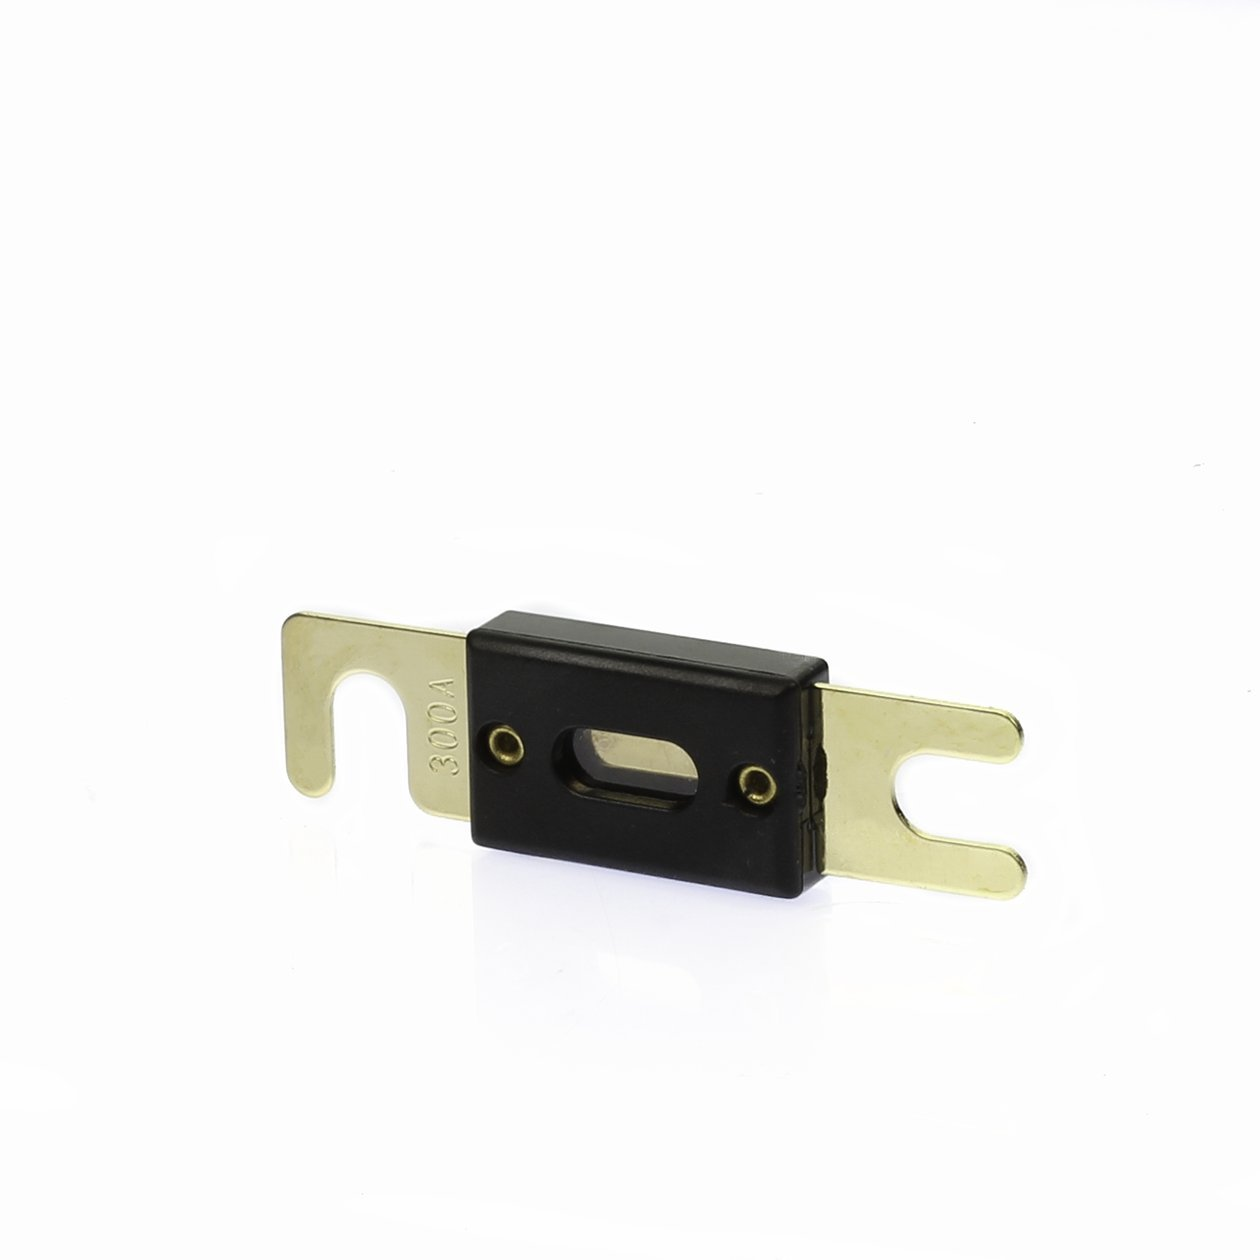 VOODOO Digital ANL Fuse - Gold Holder 1/0 0 Gauge w/ 45 Deg Angled Cover W/Fuse (300 AMP)